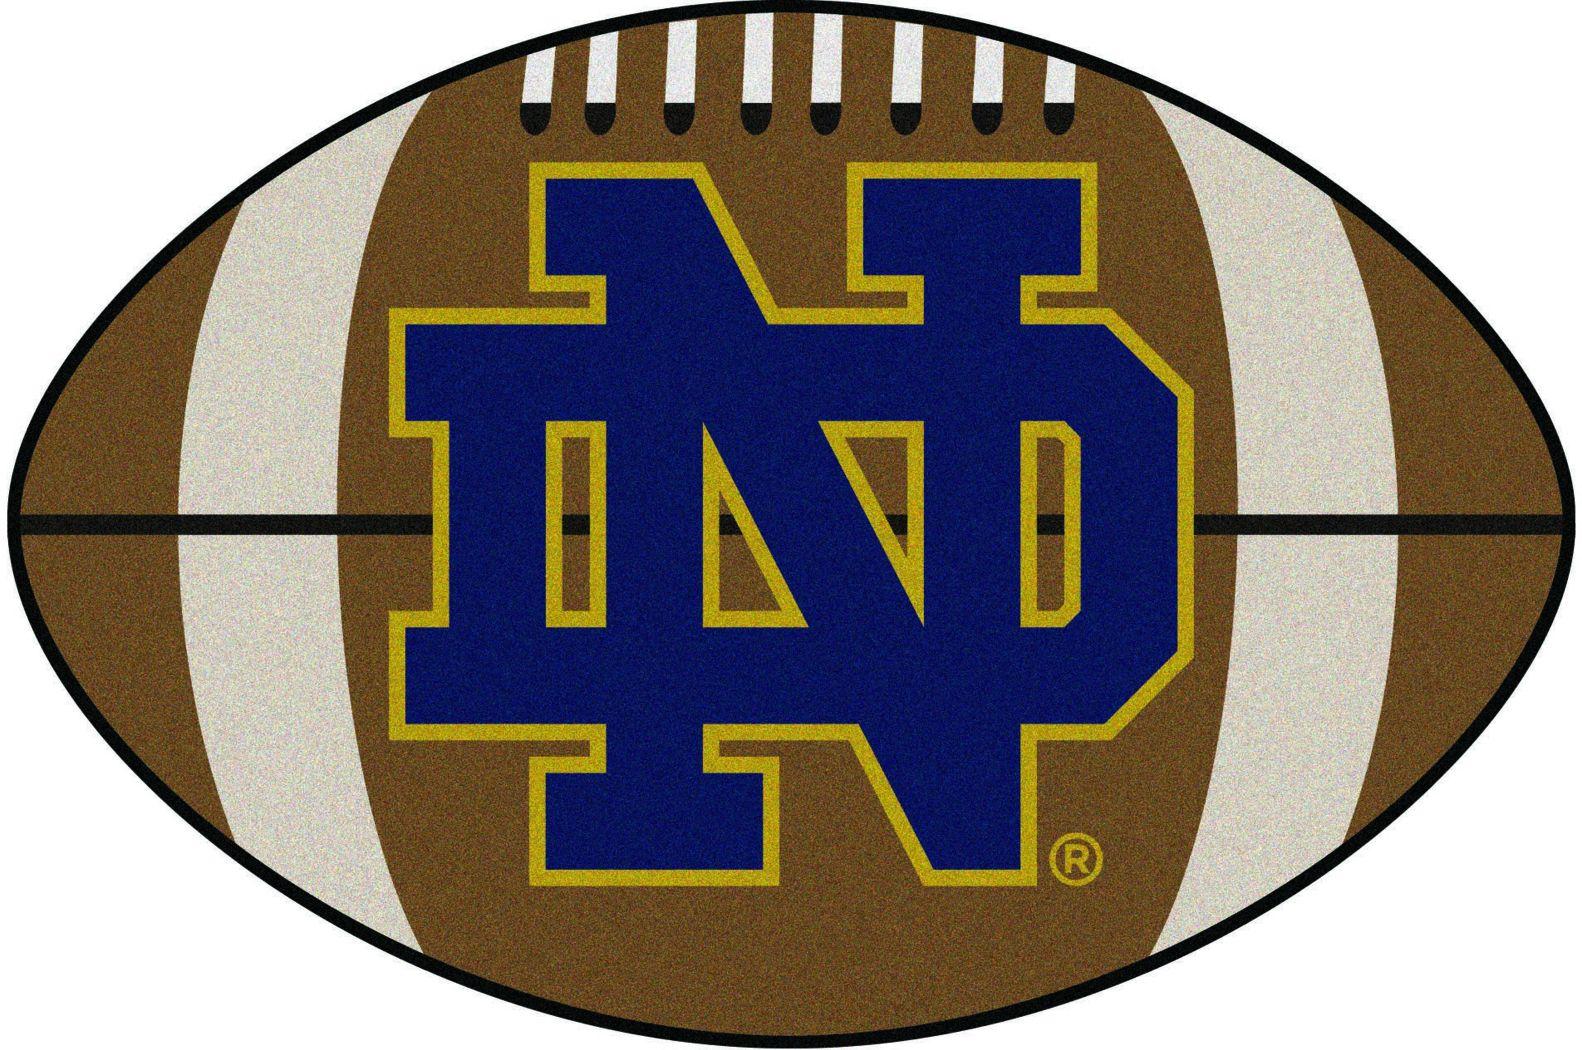 "NCAA Football Mascot Notre Dame 1'6"" x 1'10"" Rug"